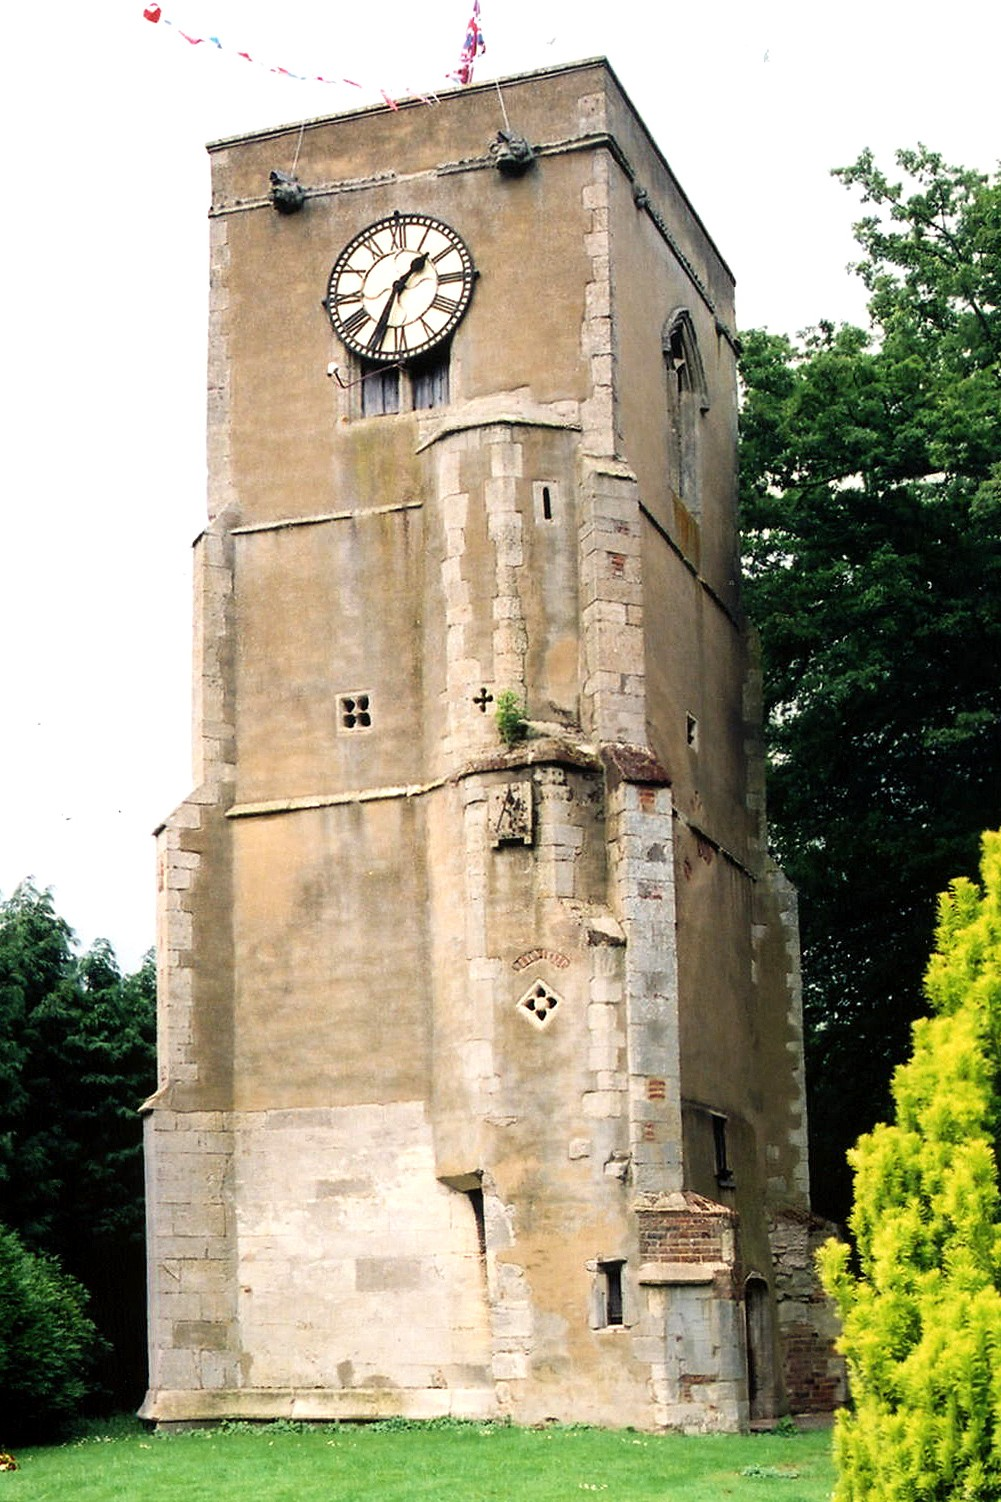 St. James Church tower